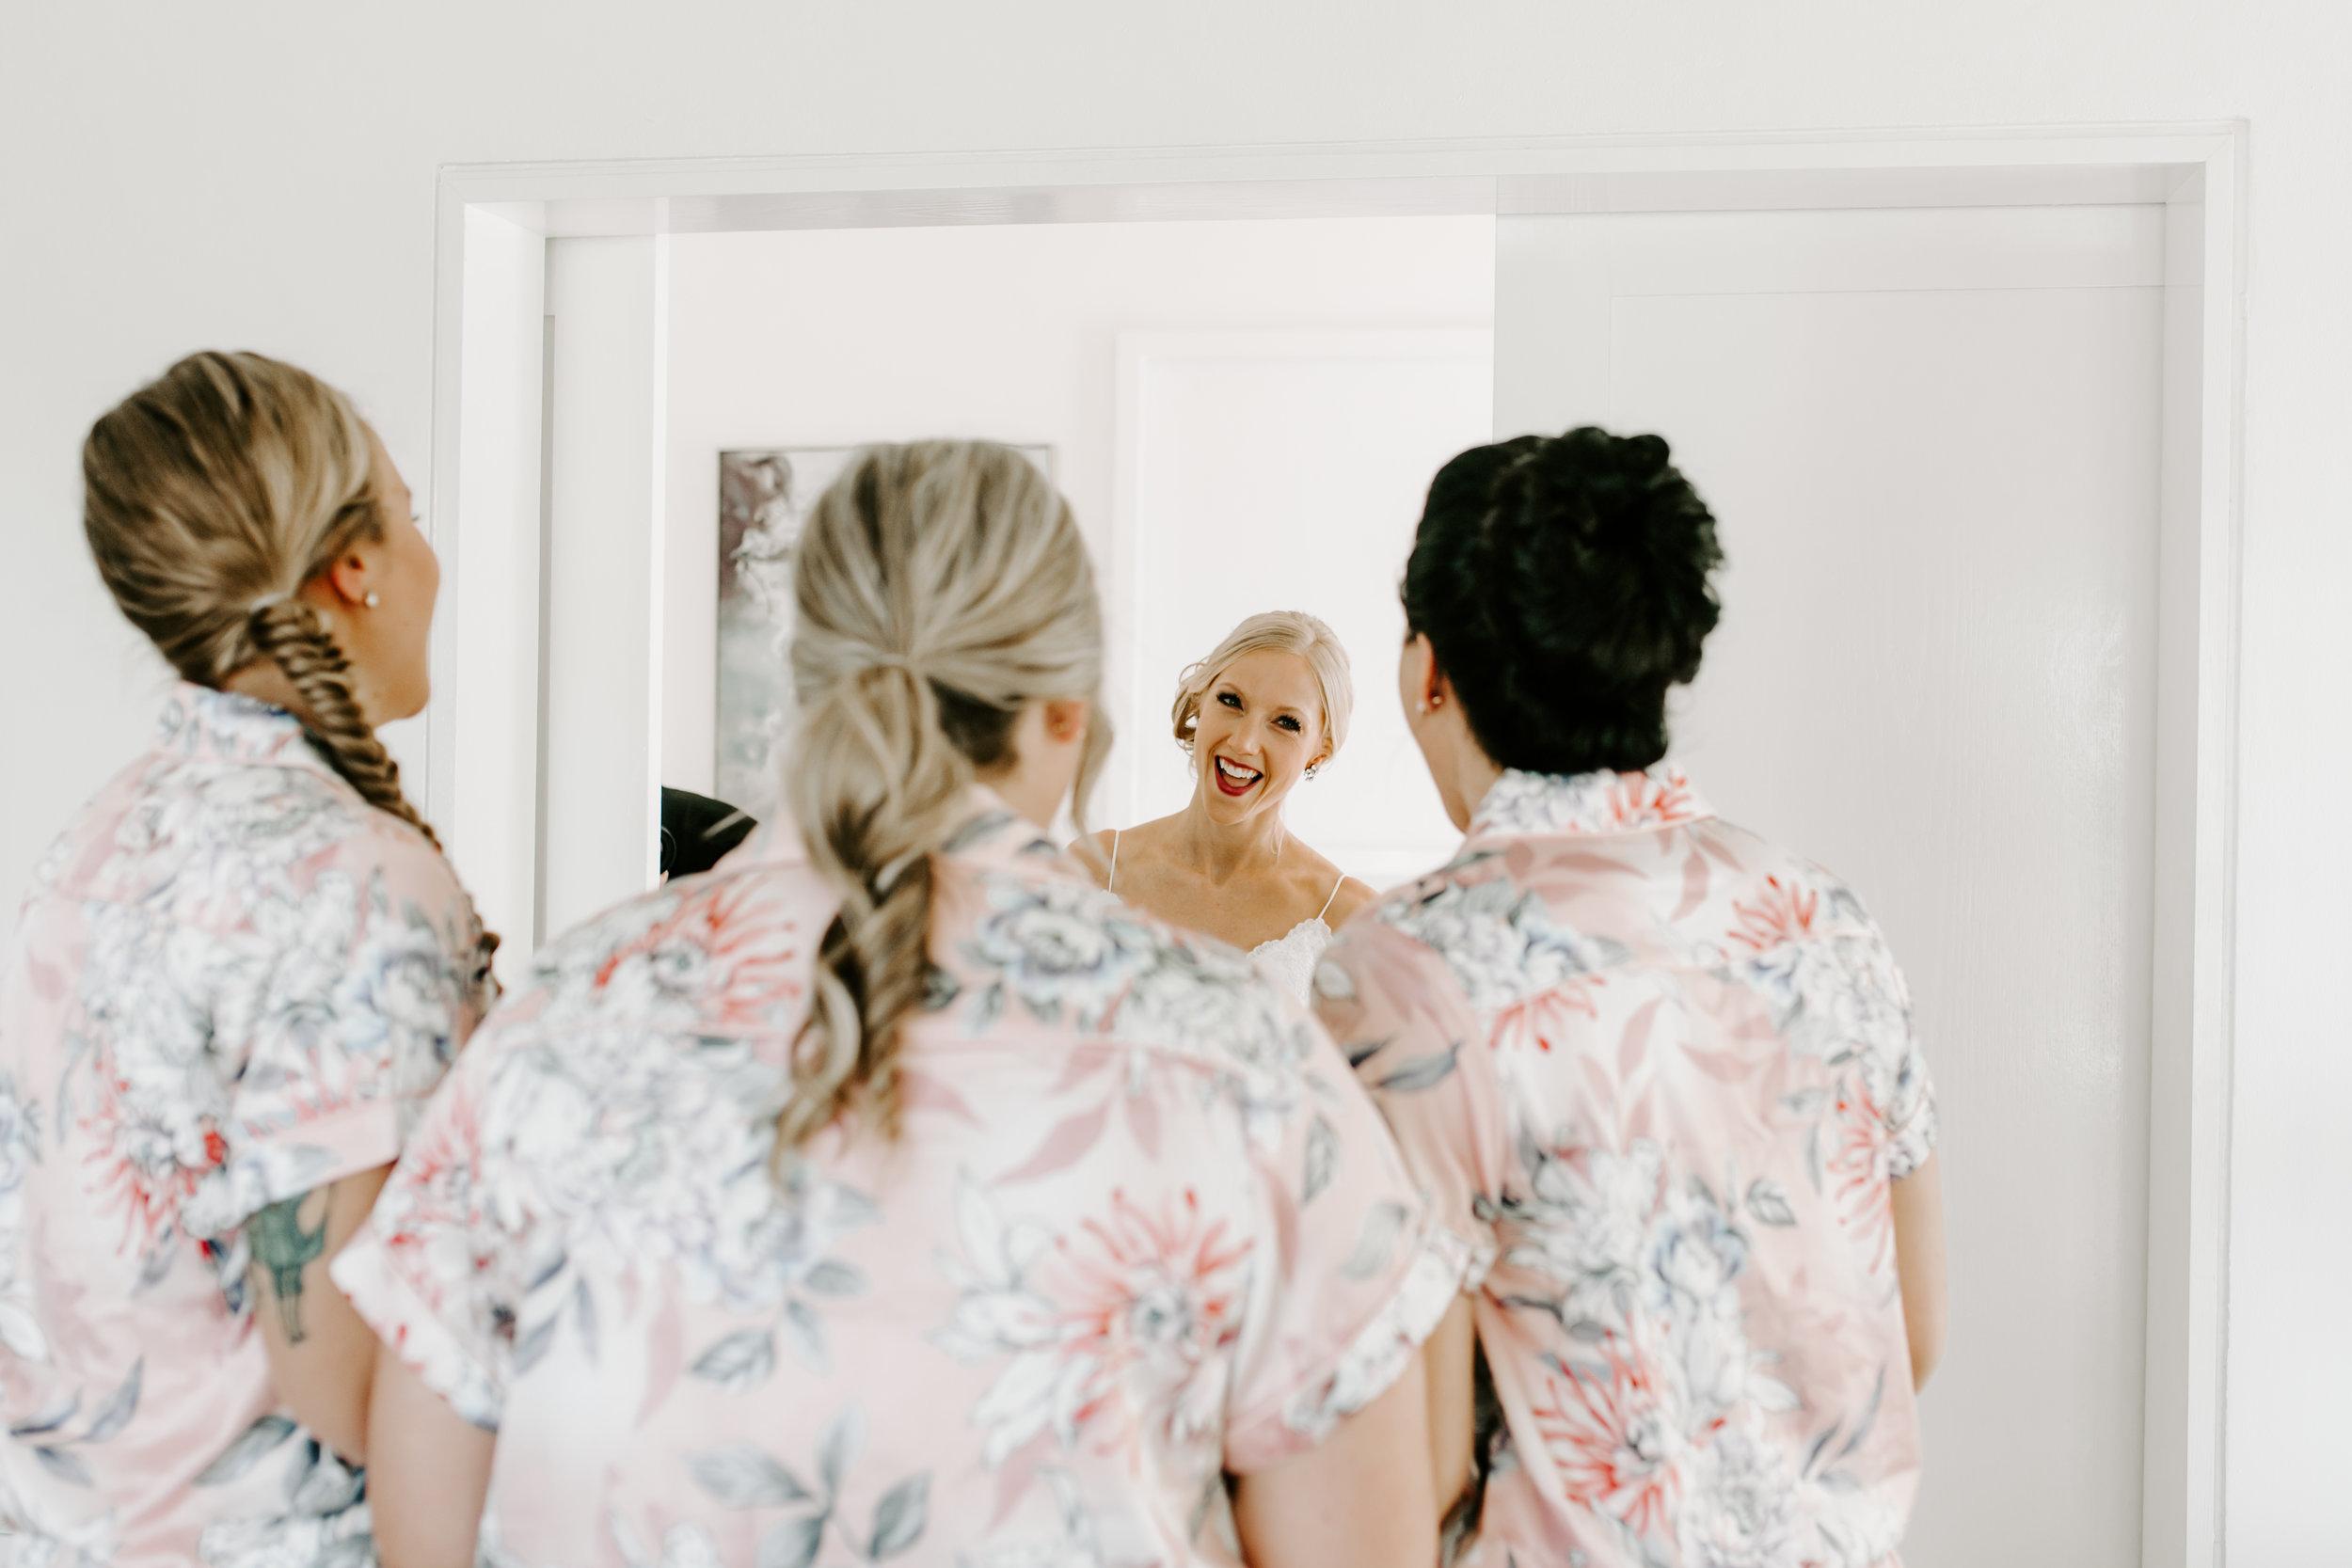 bridesmaids, destination wedding, first look, beach wedding, jamaican wedding, define fettle, jamaica wedding recap